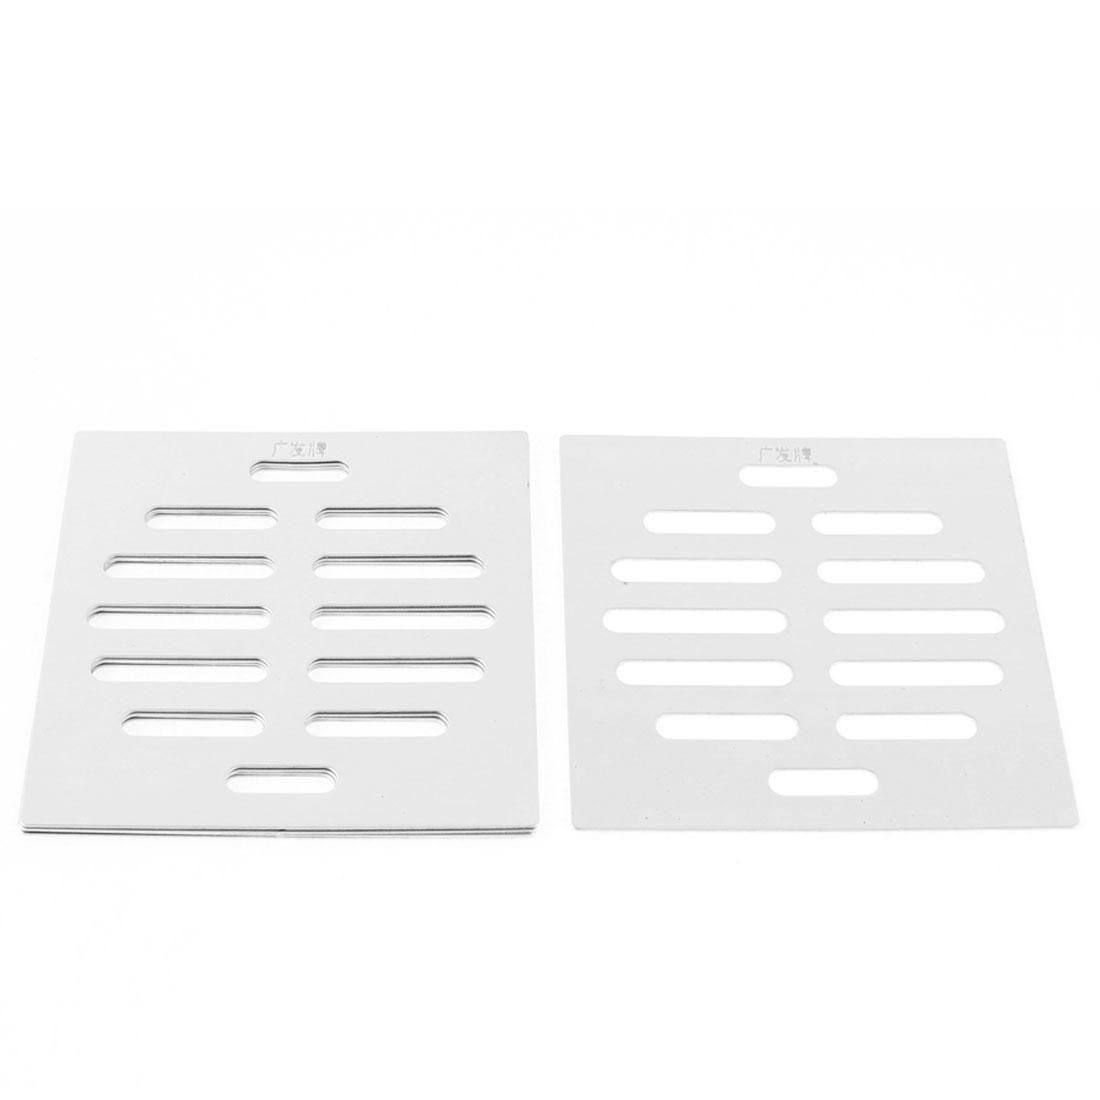 "Stainless Steel Kitchen Bathroom Square Floor Drain Cover 4"" 10cm 5pcs"